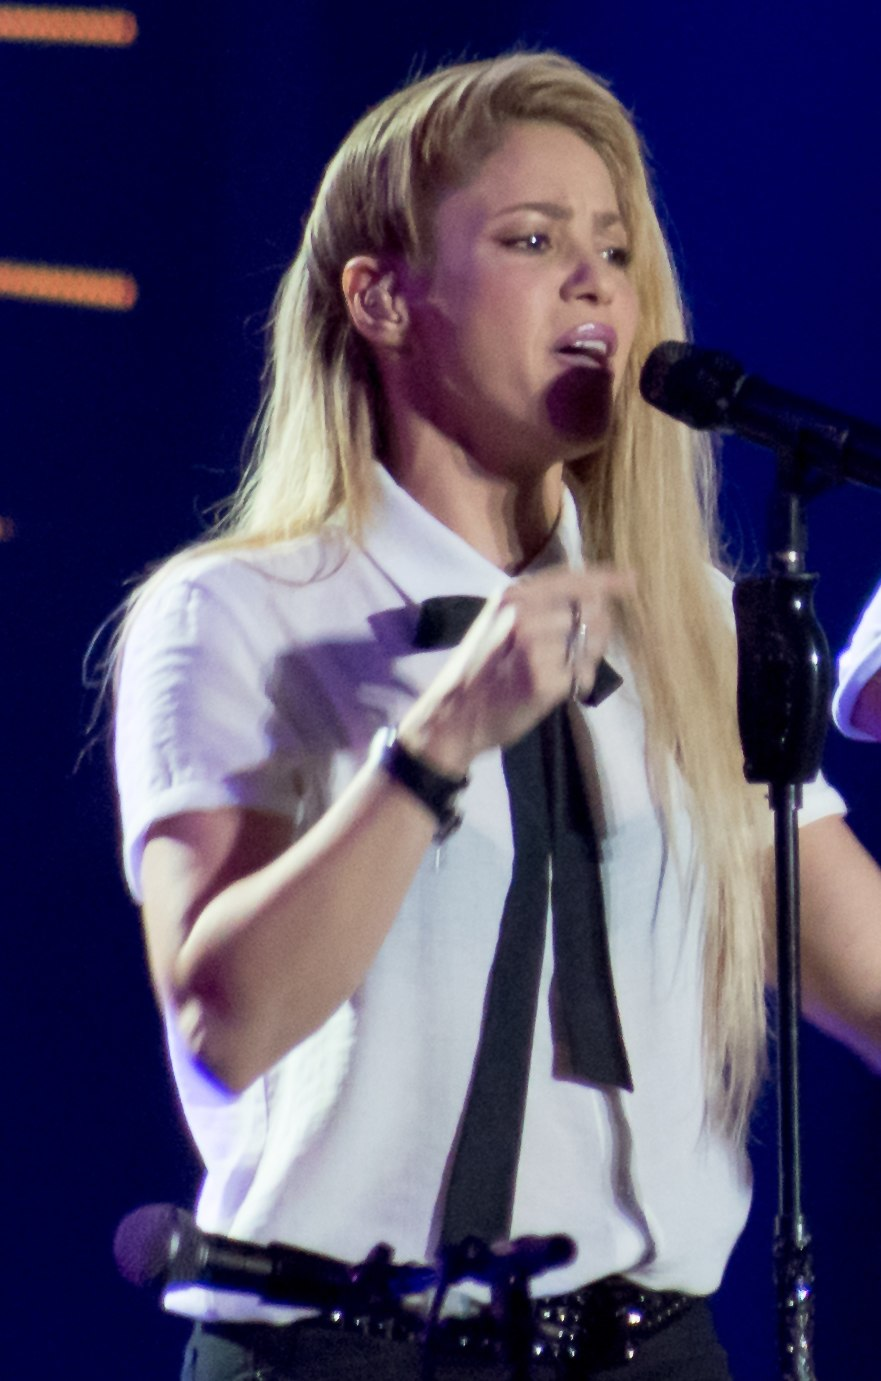 Shakira %26 Chris Martin - Global Citizen Festival Hamburg 04 (cropped)